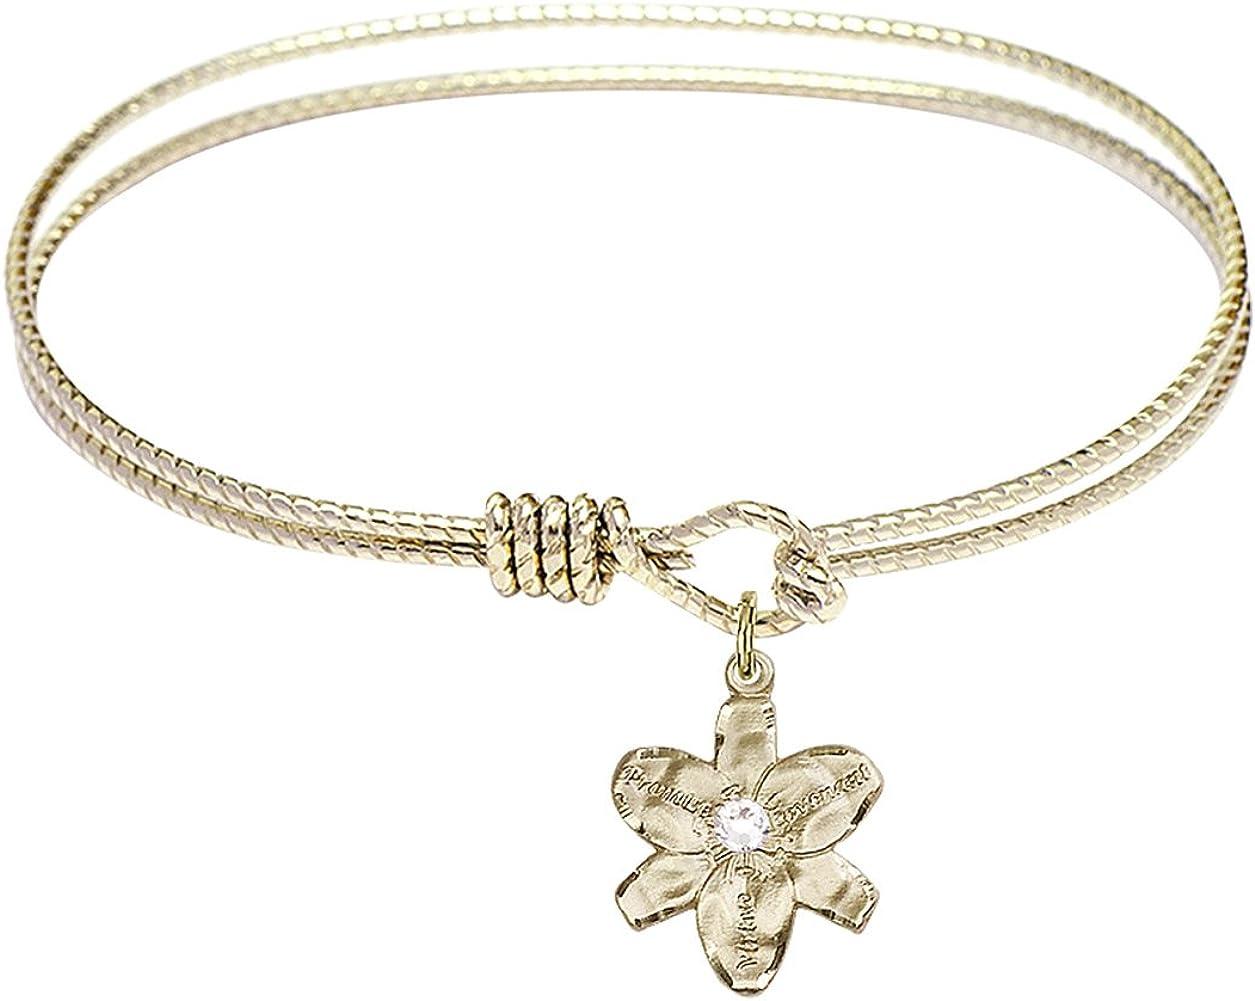 High quality DiamondJewelryNY Eye Hook Bangle San Antonio Mall Bracelet a Charm. Chastity with